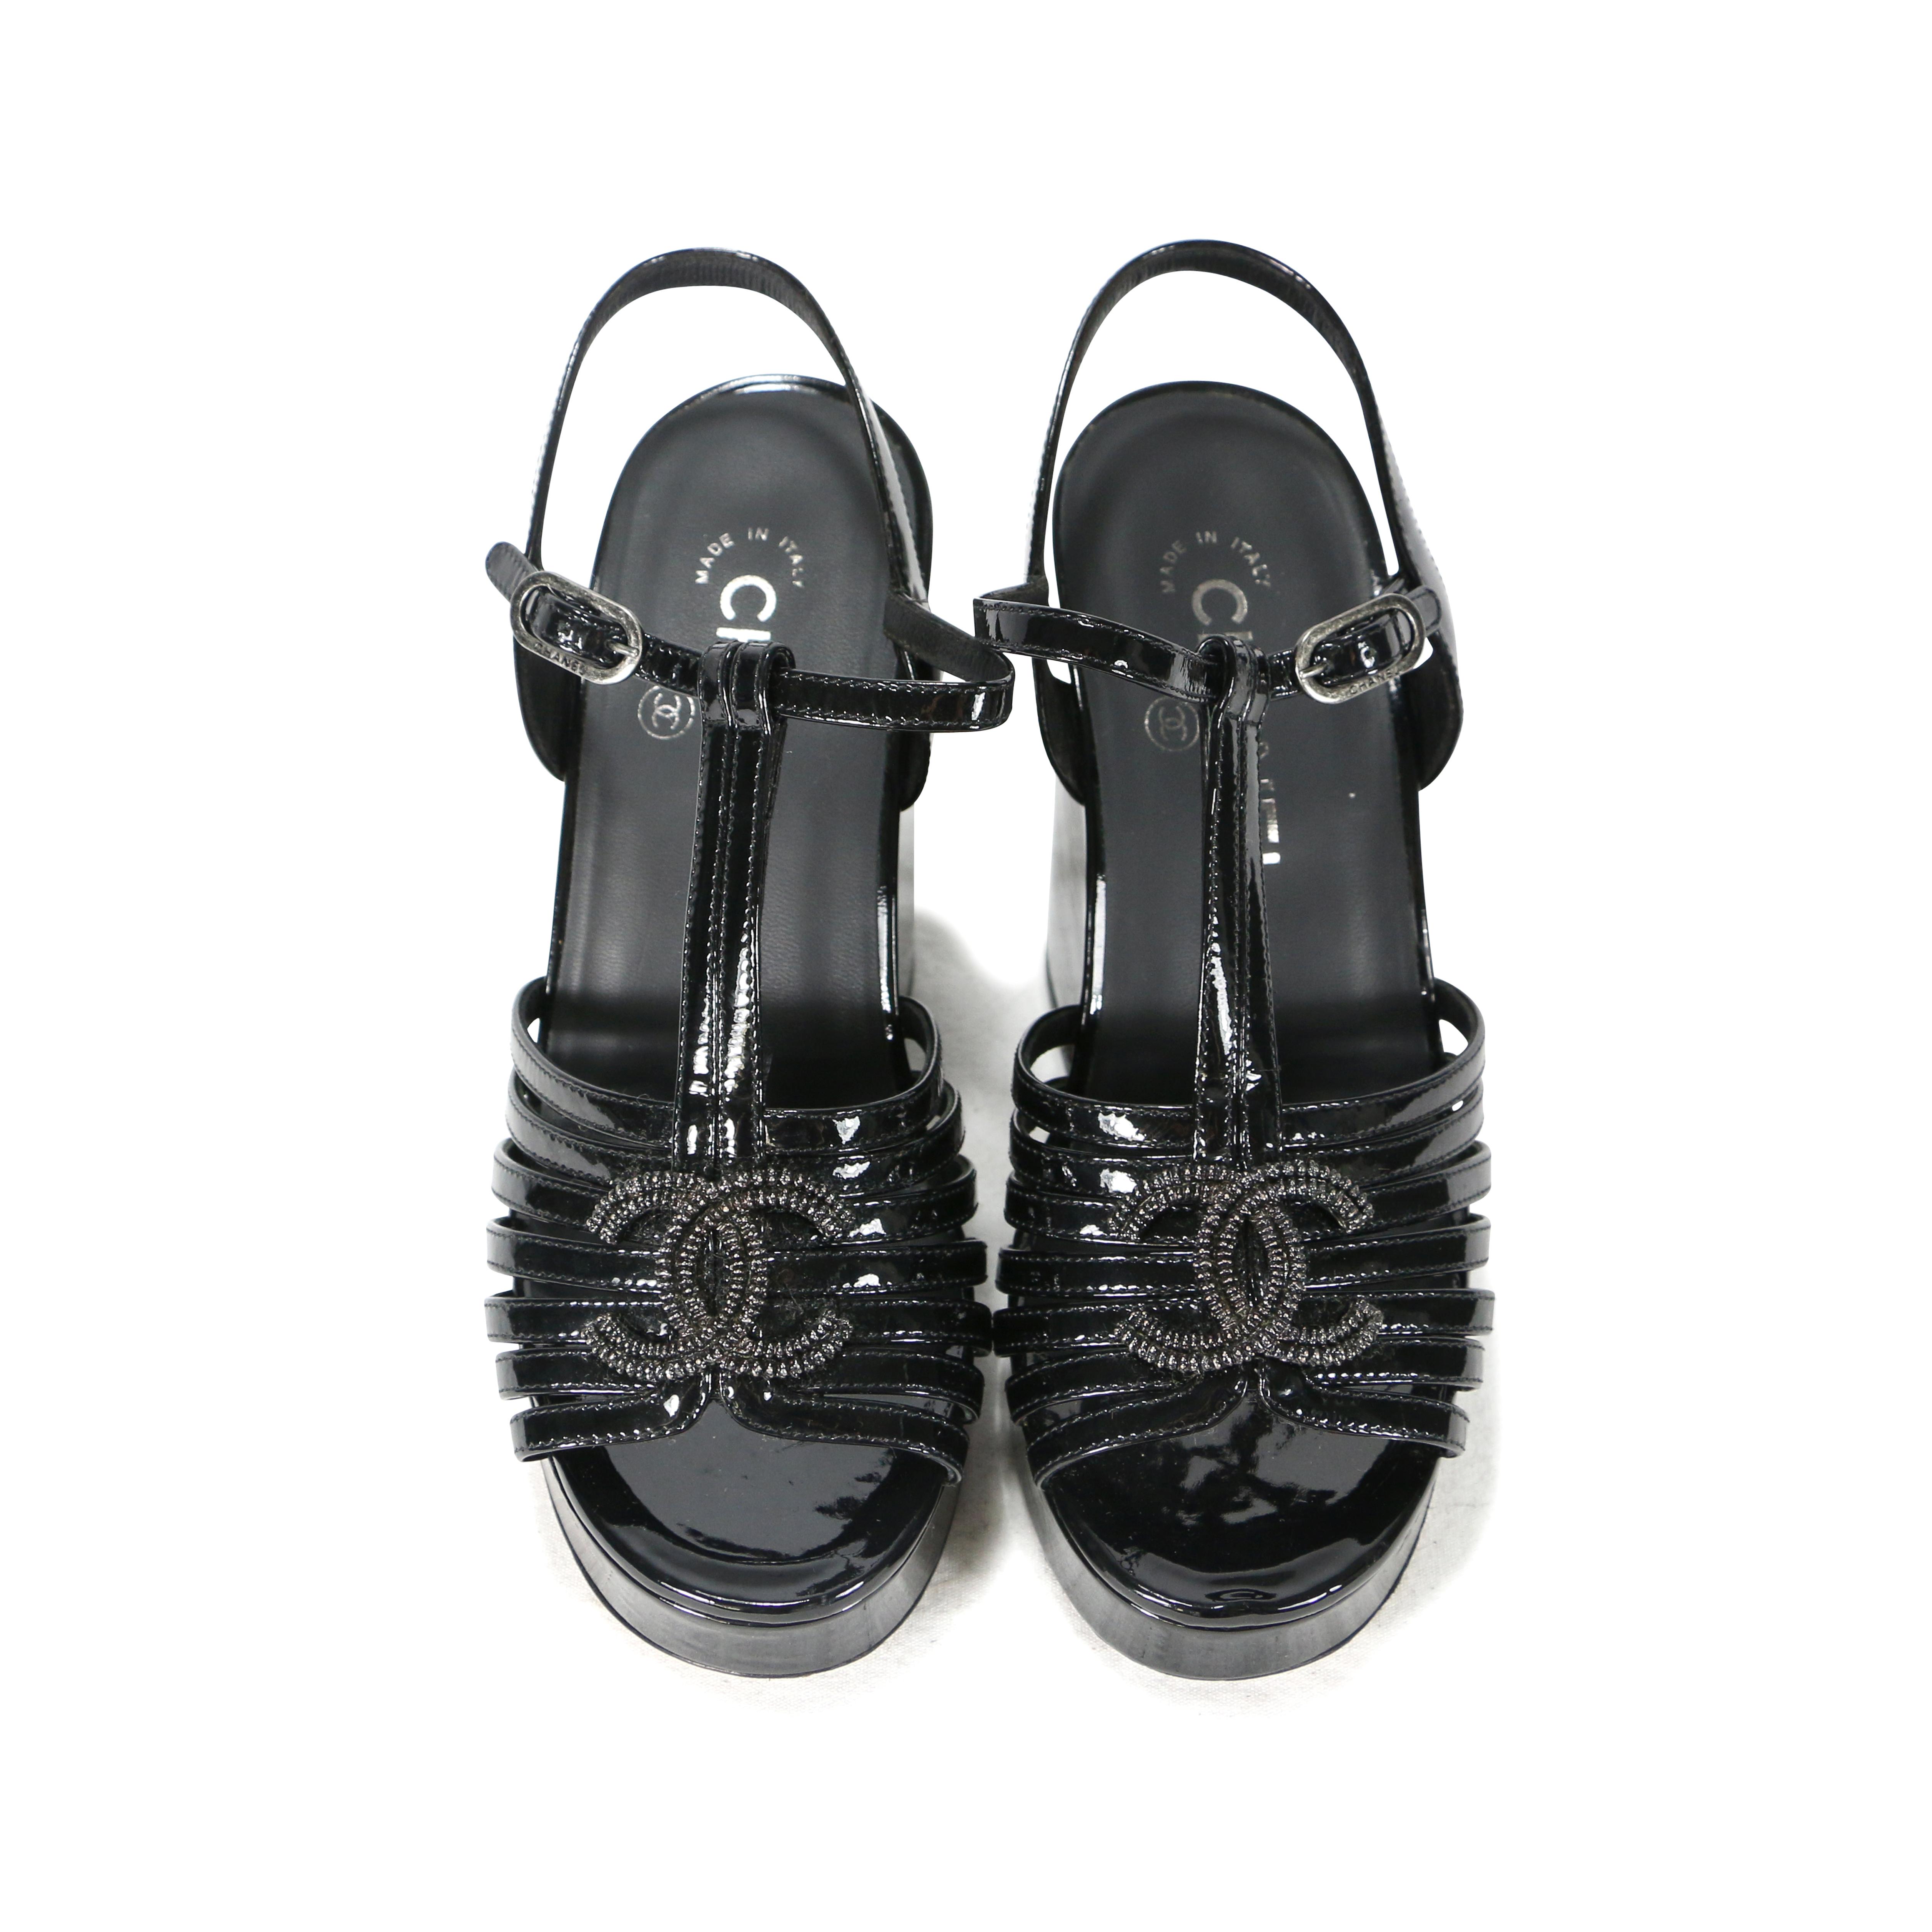 320541d9633d Authentic Second Hand Chanel Patent Leather T Strap Platforms  (PSS-200-00284)